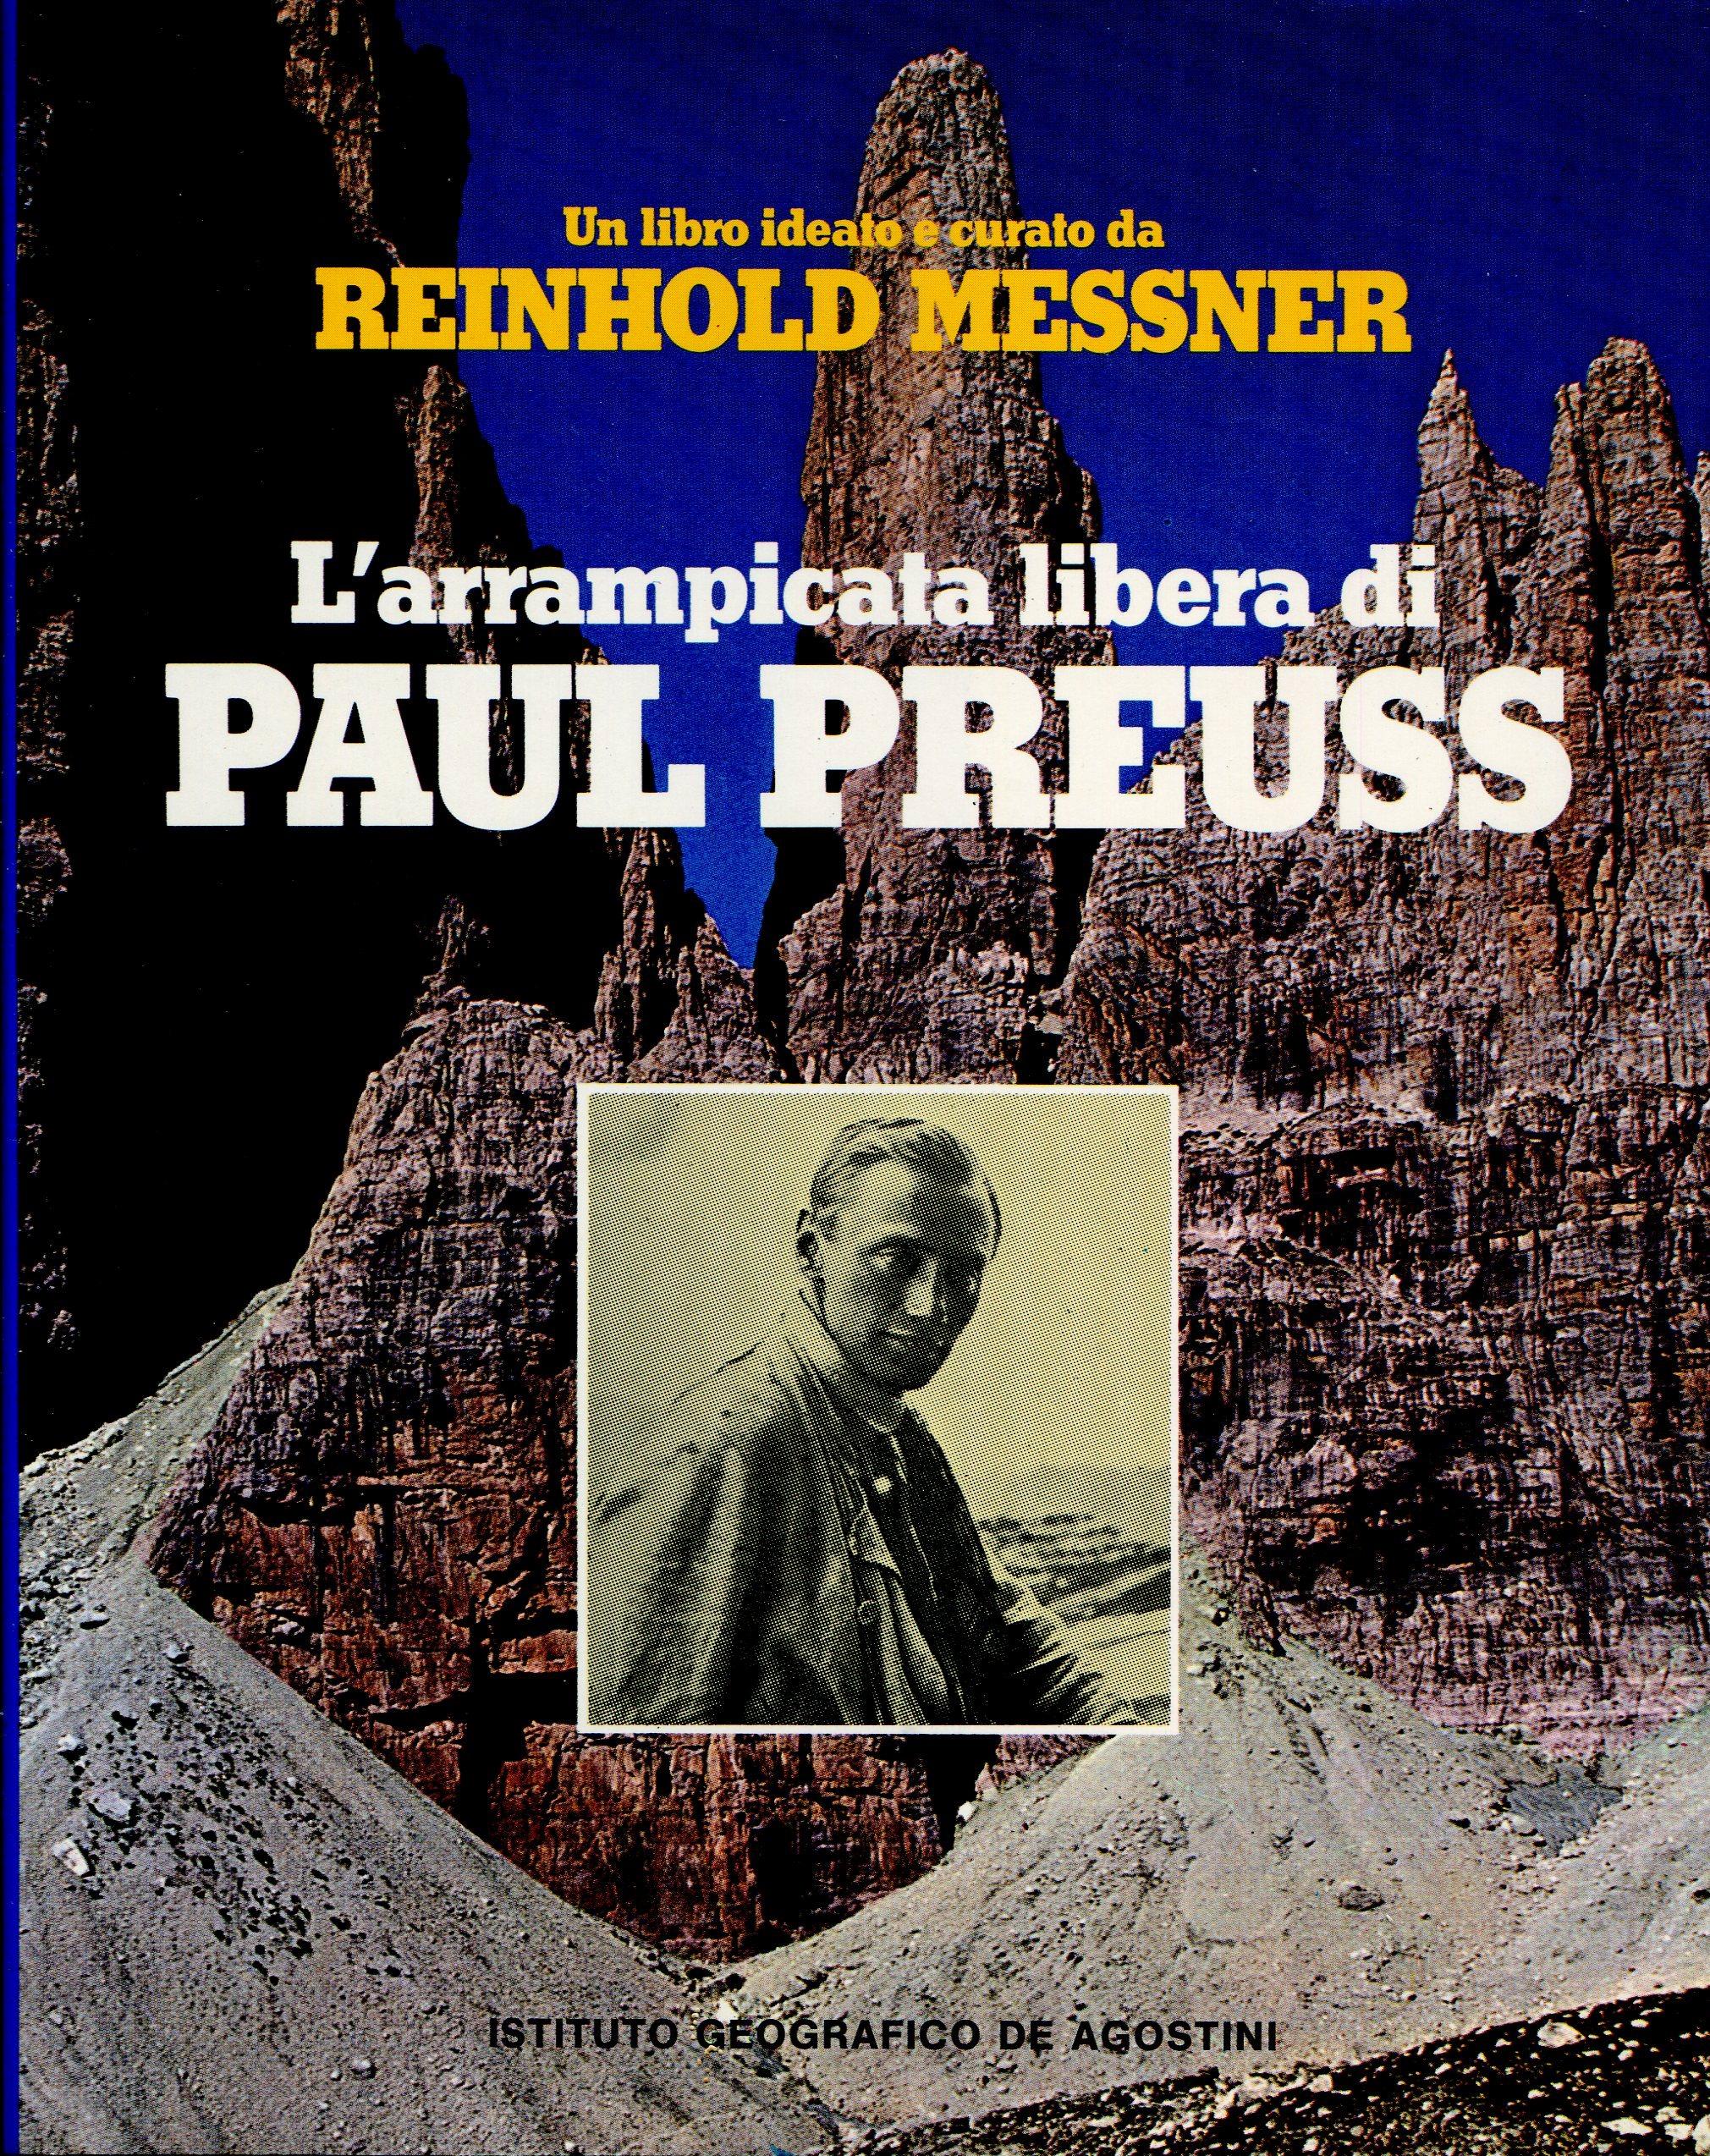 L'arrampicata libera di Paul Preuss